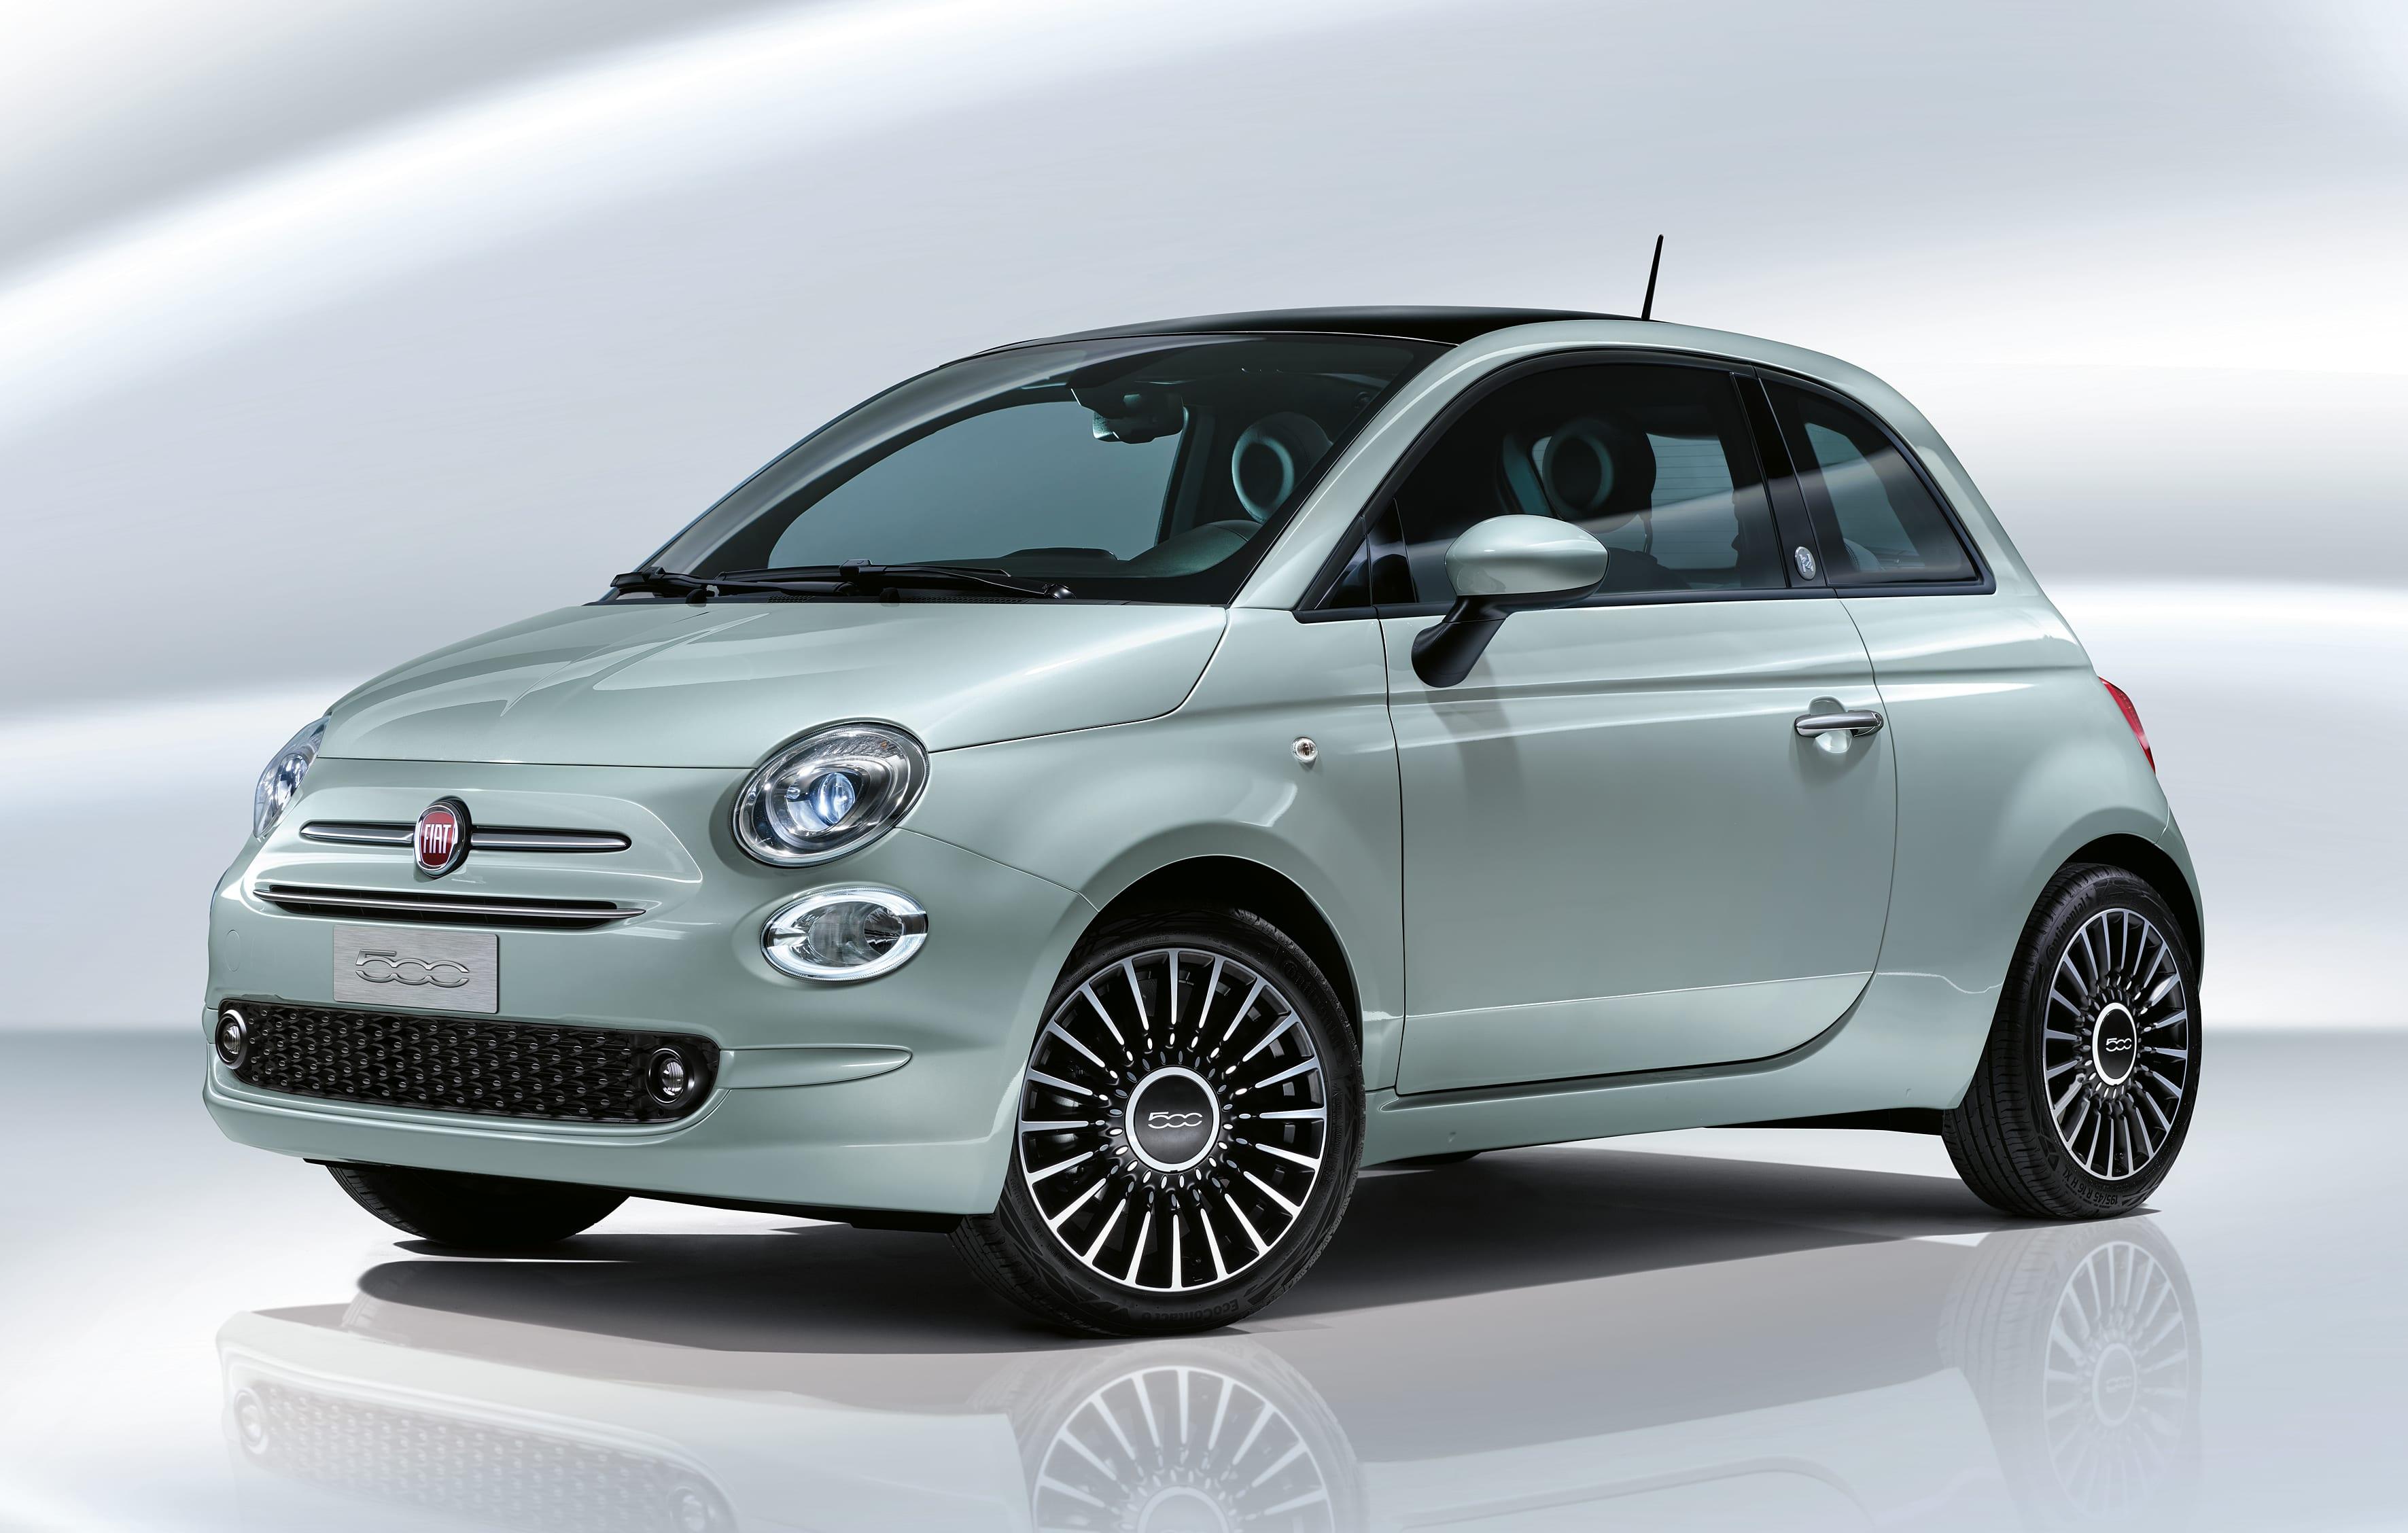 Fiat 500 hybrid launch edition - schuin voorkant